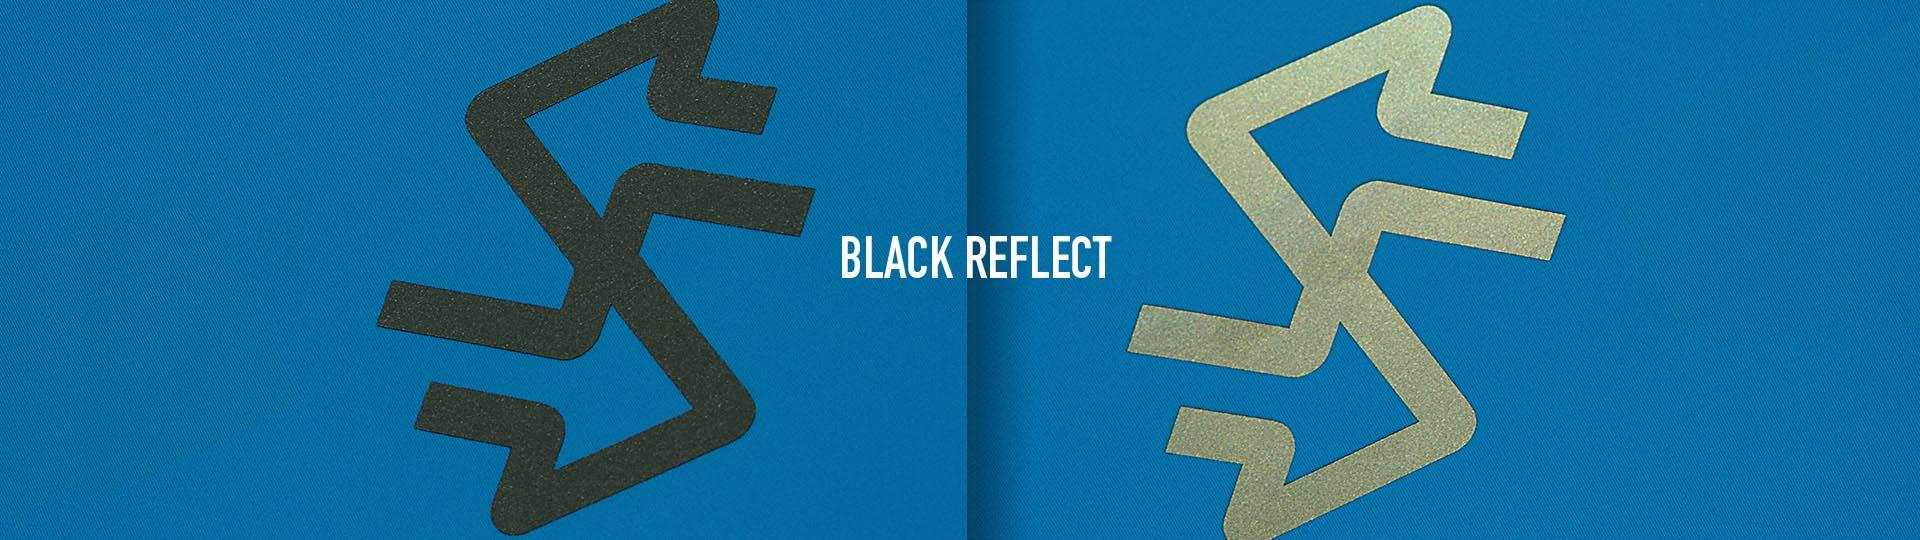 REFLECTIVE TRANSFER - image 4